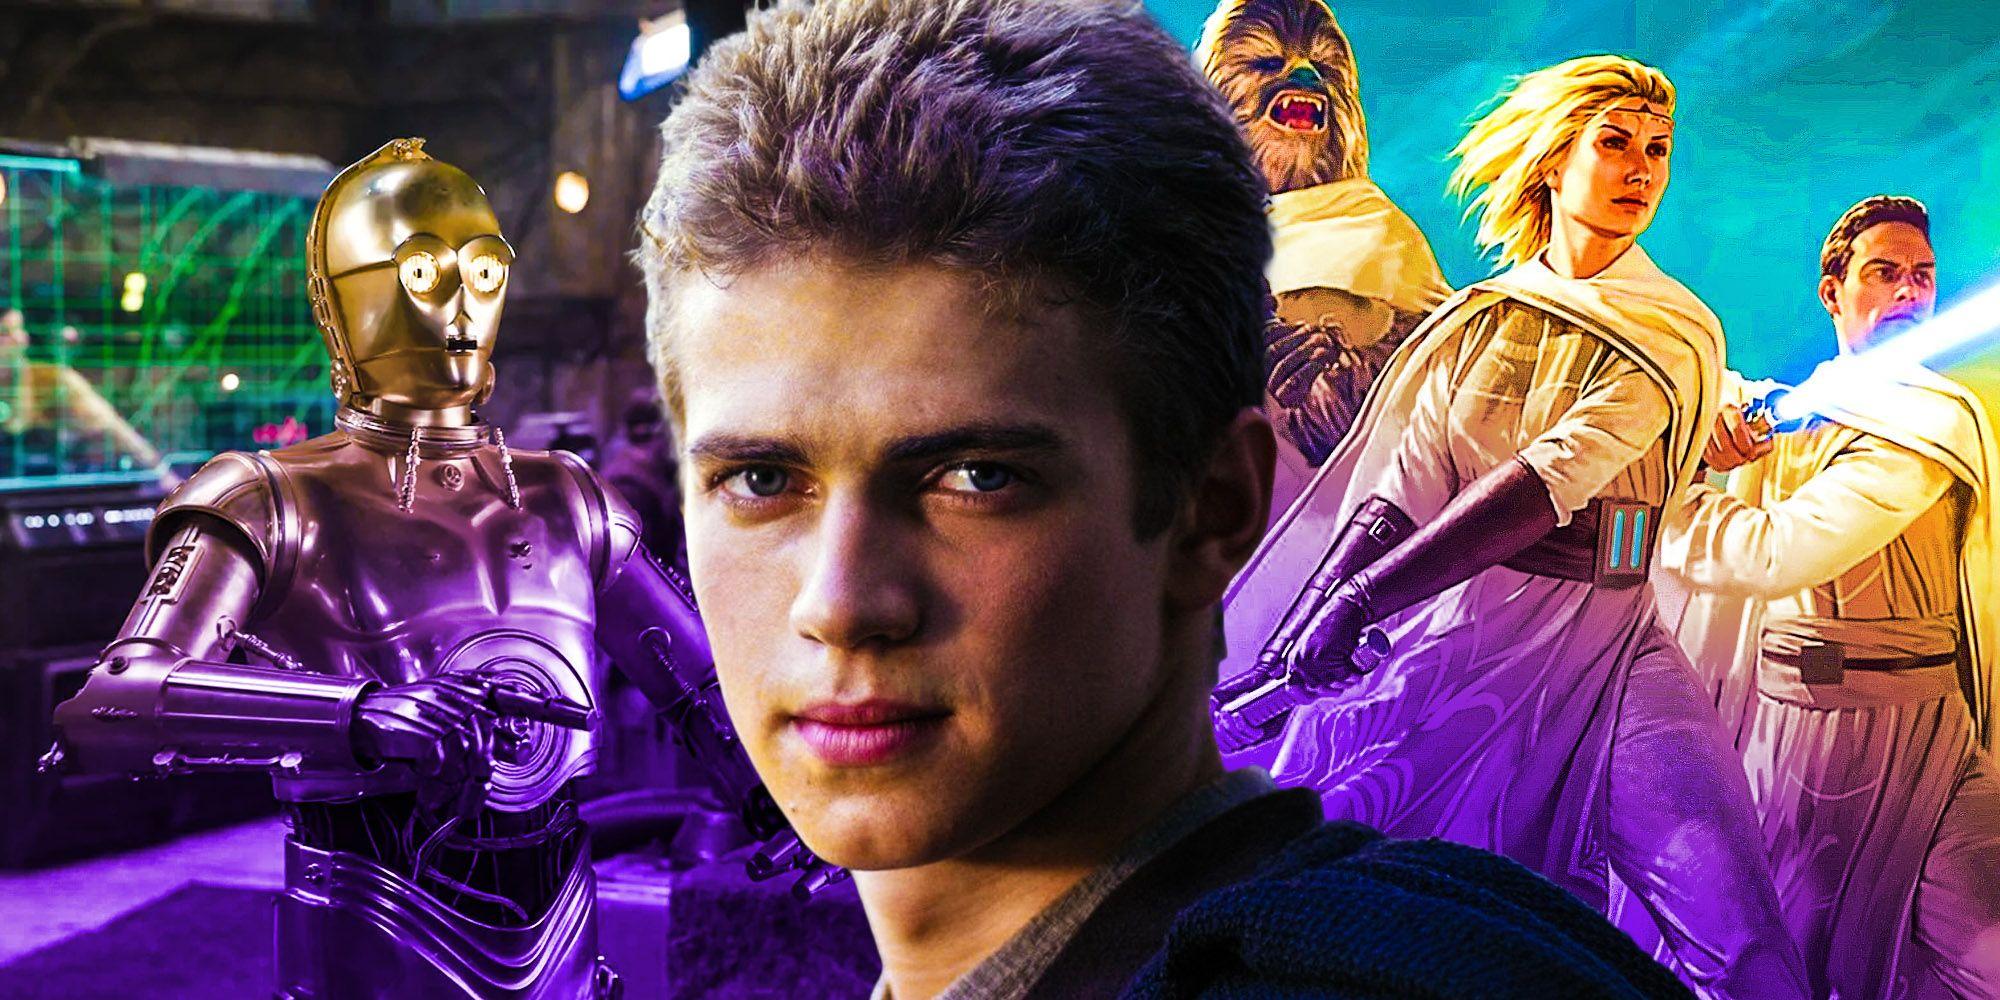 Star Wars Anakin Skywalker build C3PO new force power high republic